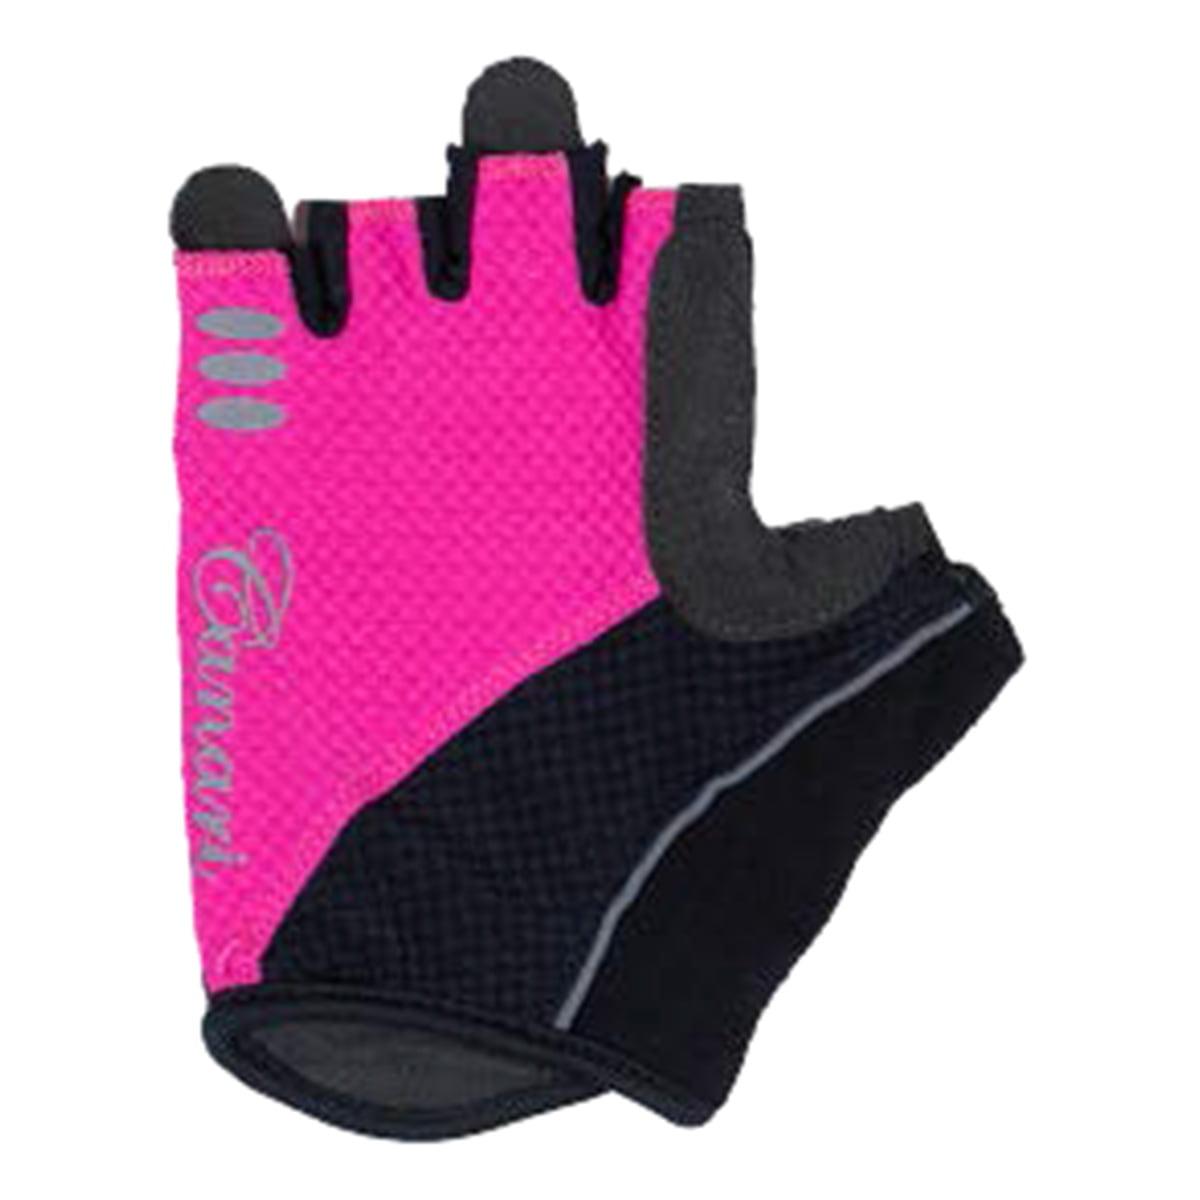 Canari Cyclewear 2016/17 Women's Aurora Short Finger Cycling Glove - 7043